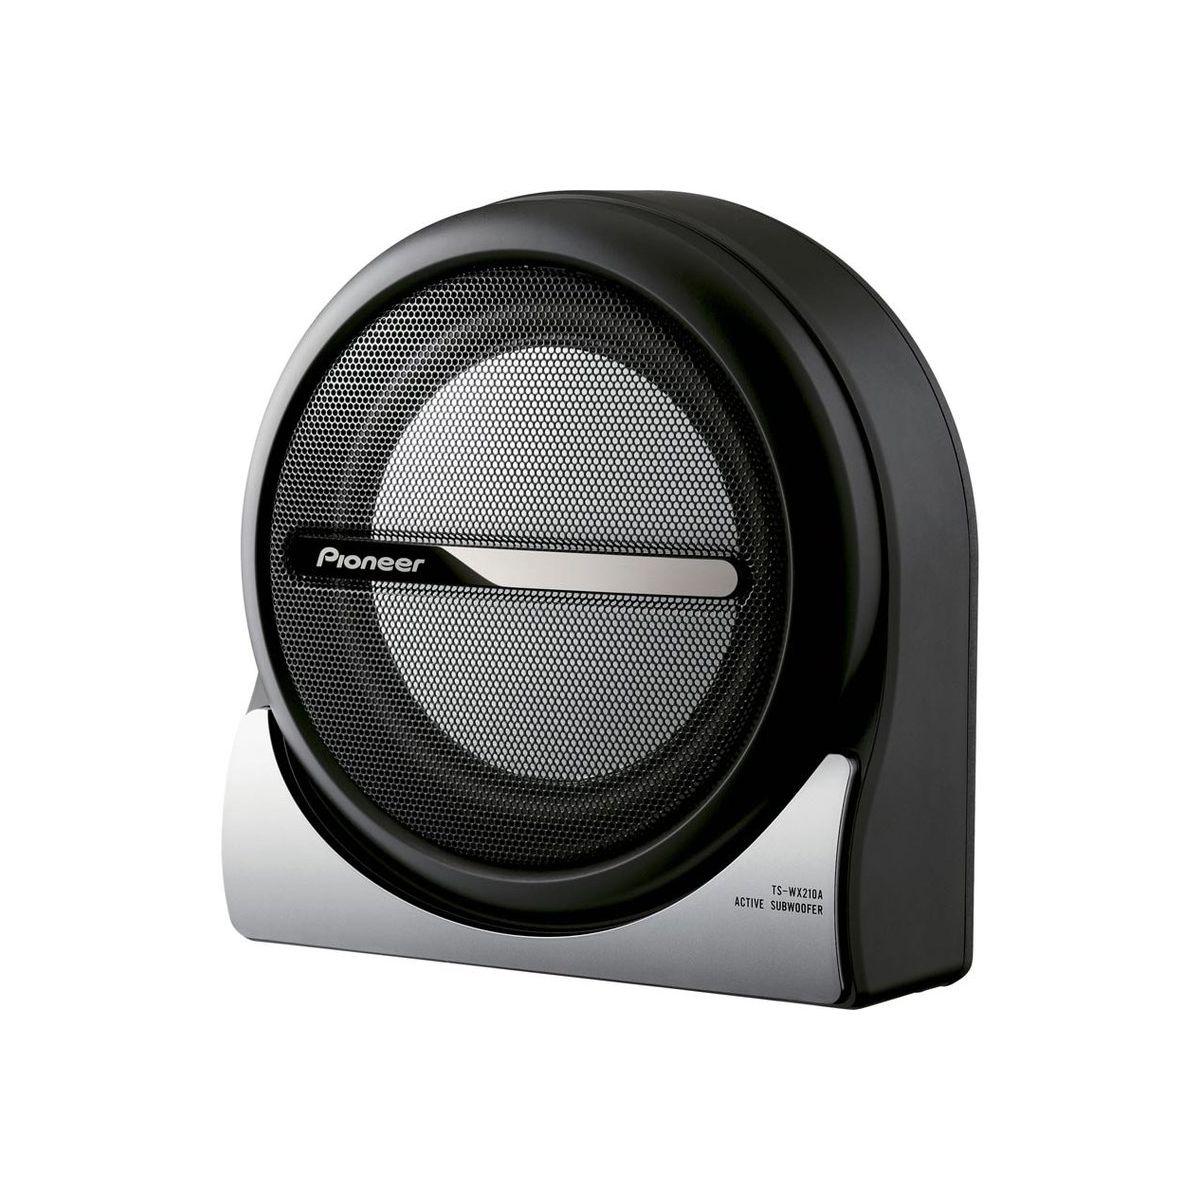 Haut-parleur autoradio pioneer ts-wx210a (photo)